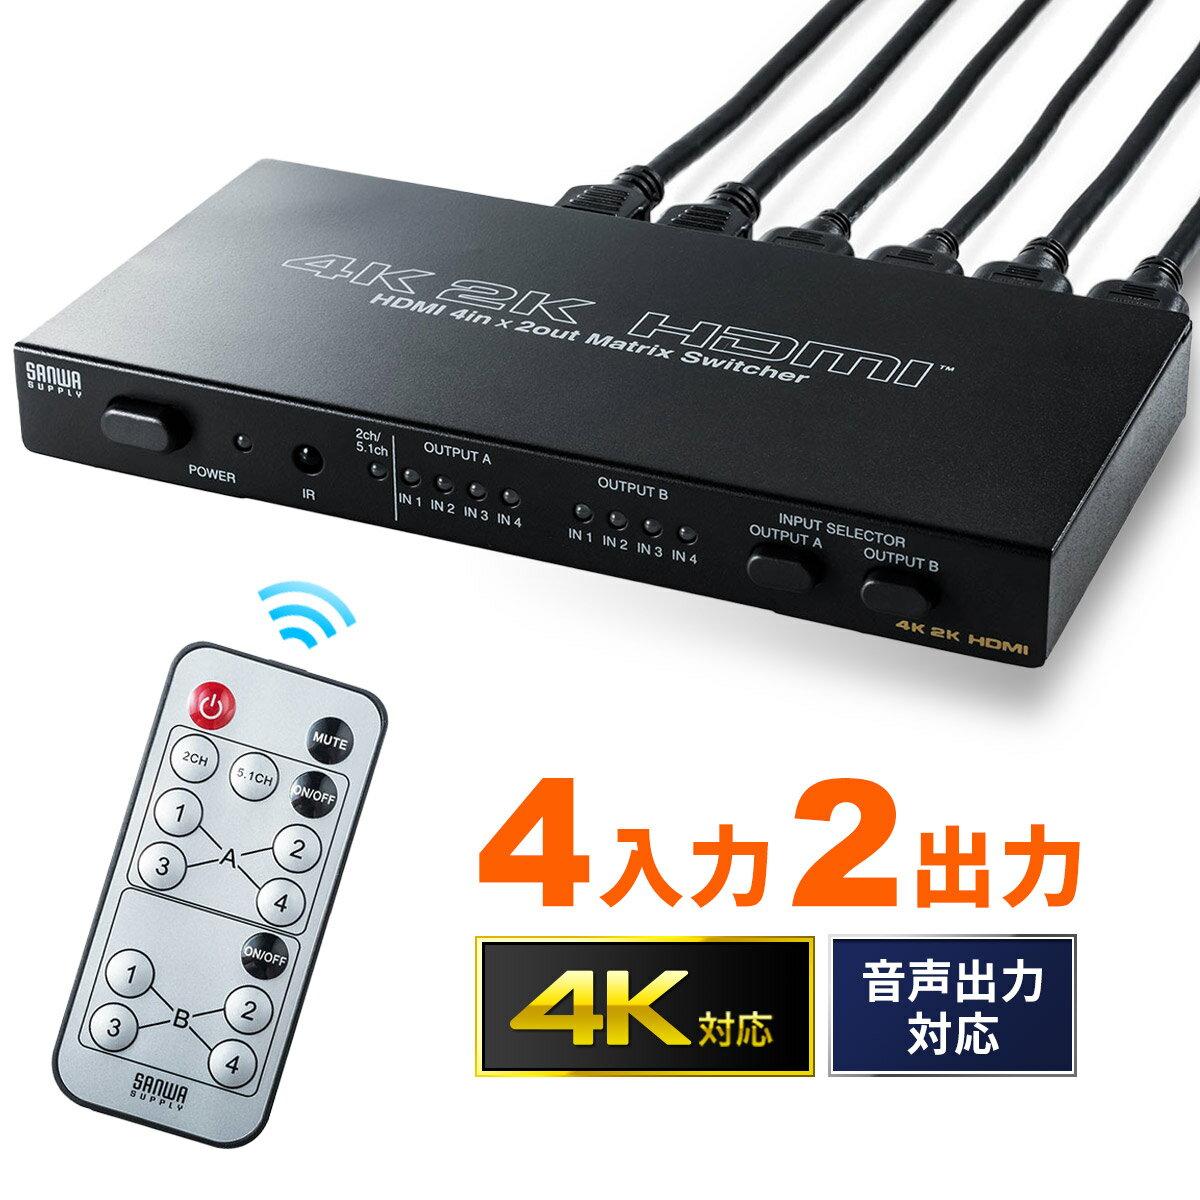 HDMI切替器 HDMIマトリックス切替器 4入力2出力 4K/30Hz対応 リモコン付き 光・同軸デジタル出力付き HDMI セレクター 切替機 手動切替 リモコン切替[400-SW027]【サンワダイレクト限定品】【送料無料】